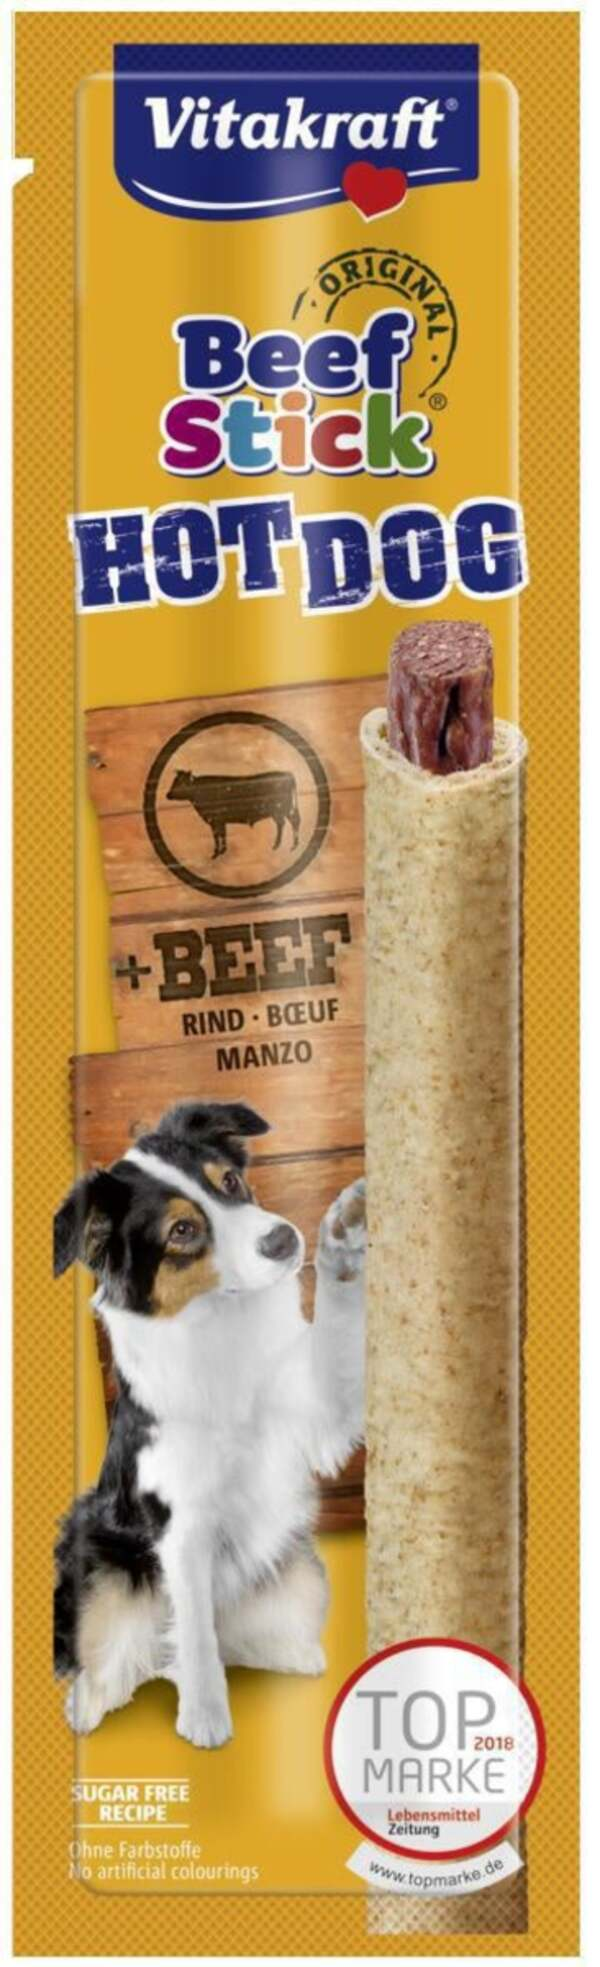 Vitakraft Beef Stick® HOT DOG + Rind